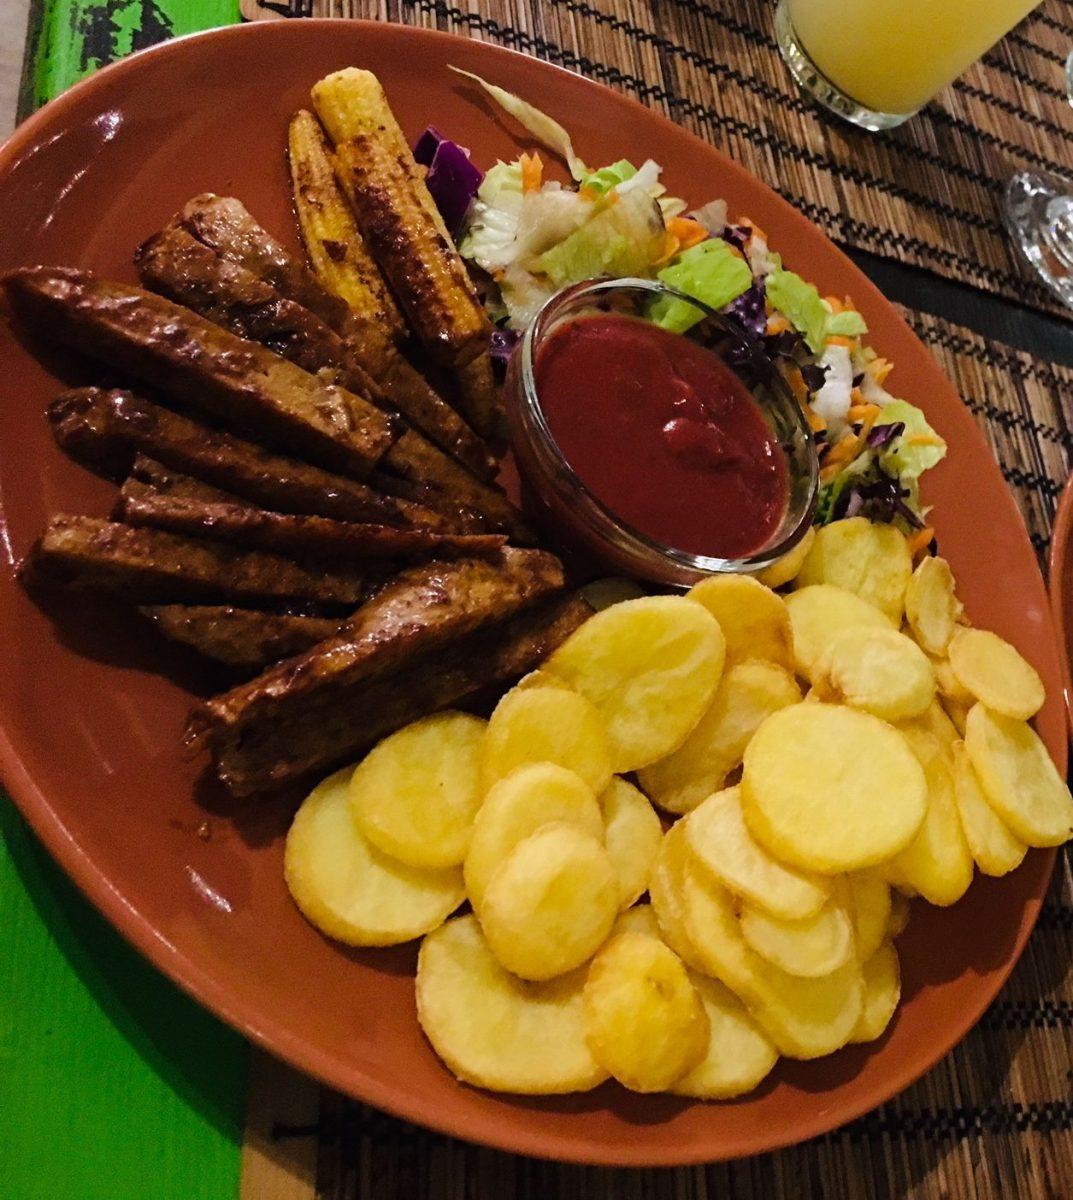 Barbeque seitan plate at Kozmosz vegan restaurant Budapest